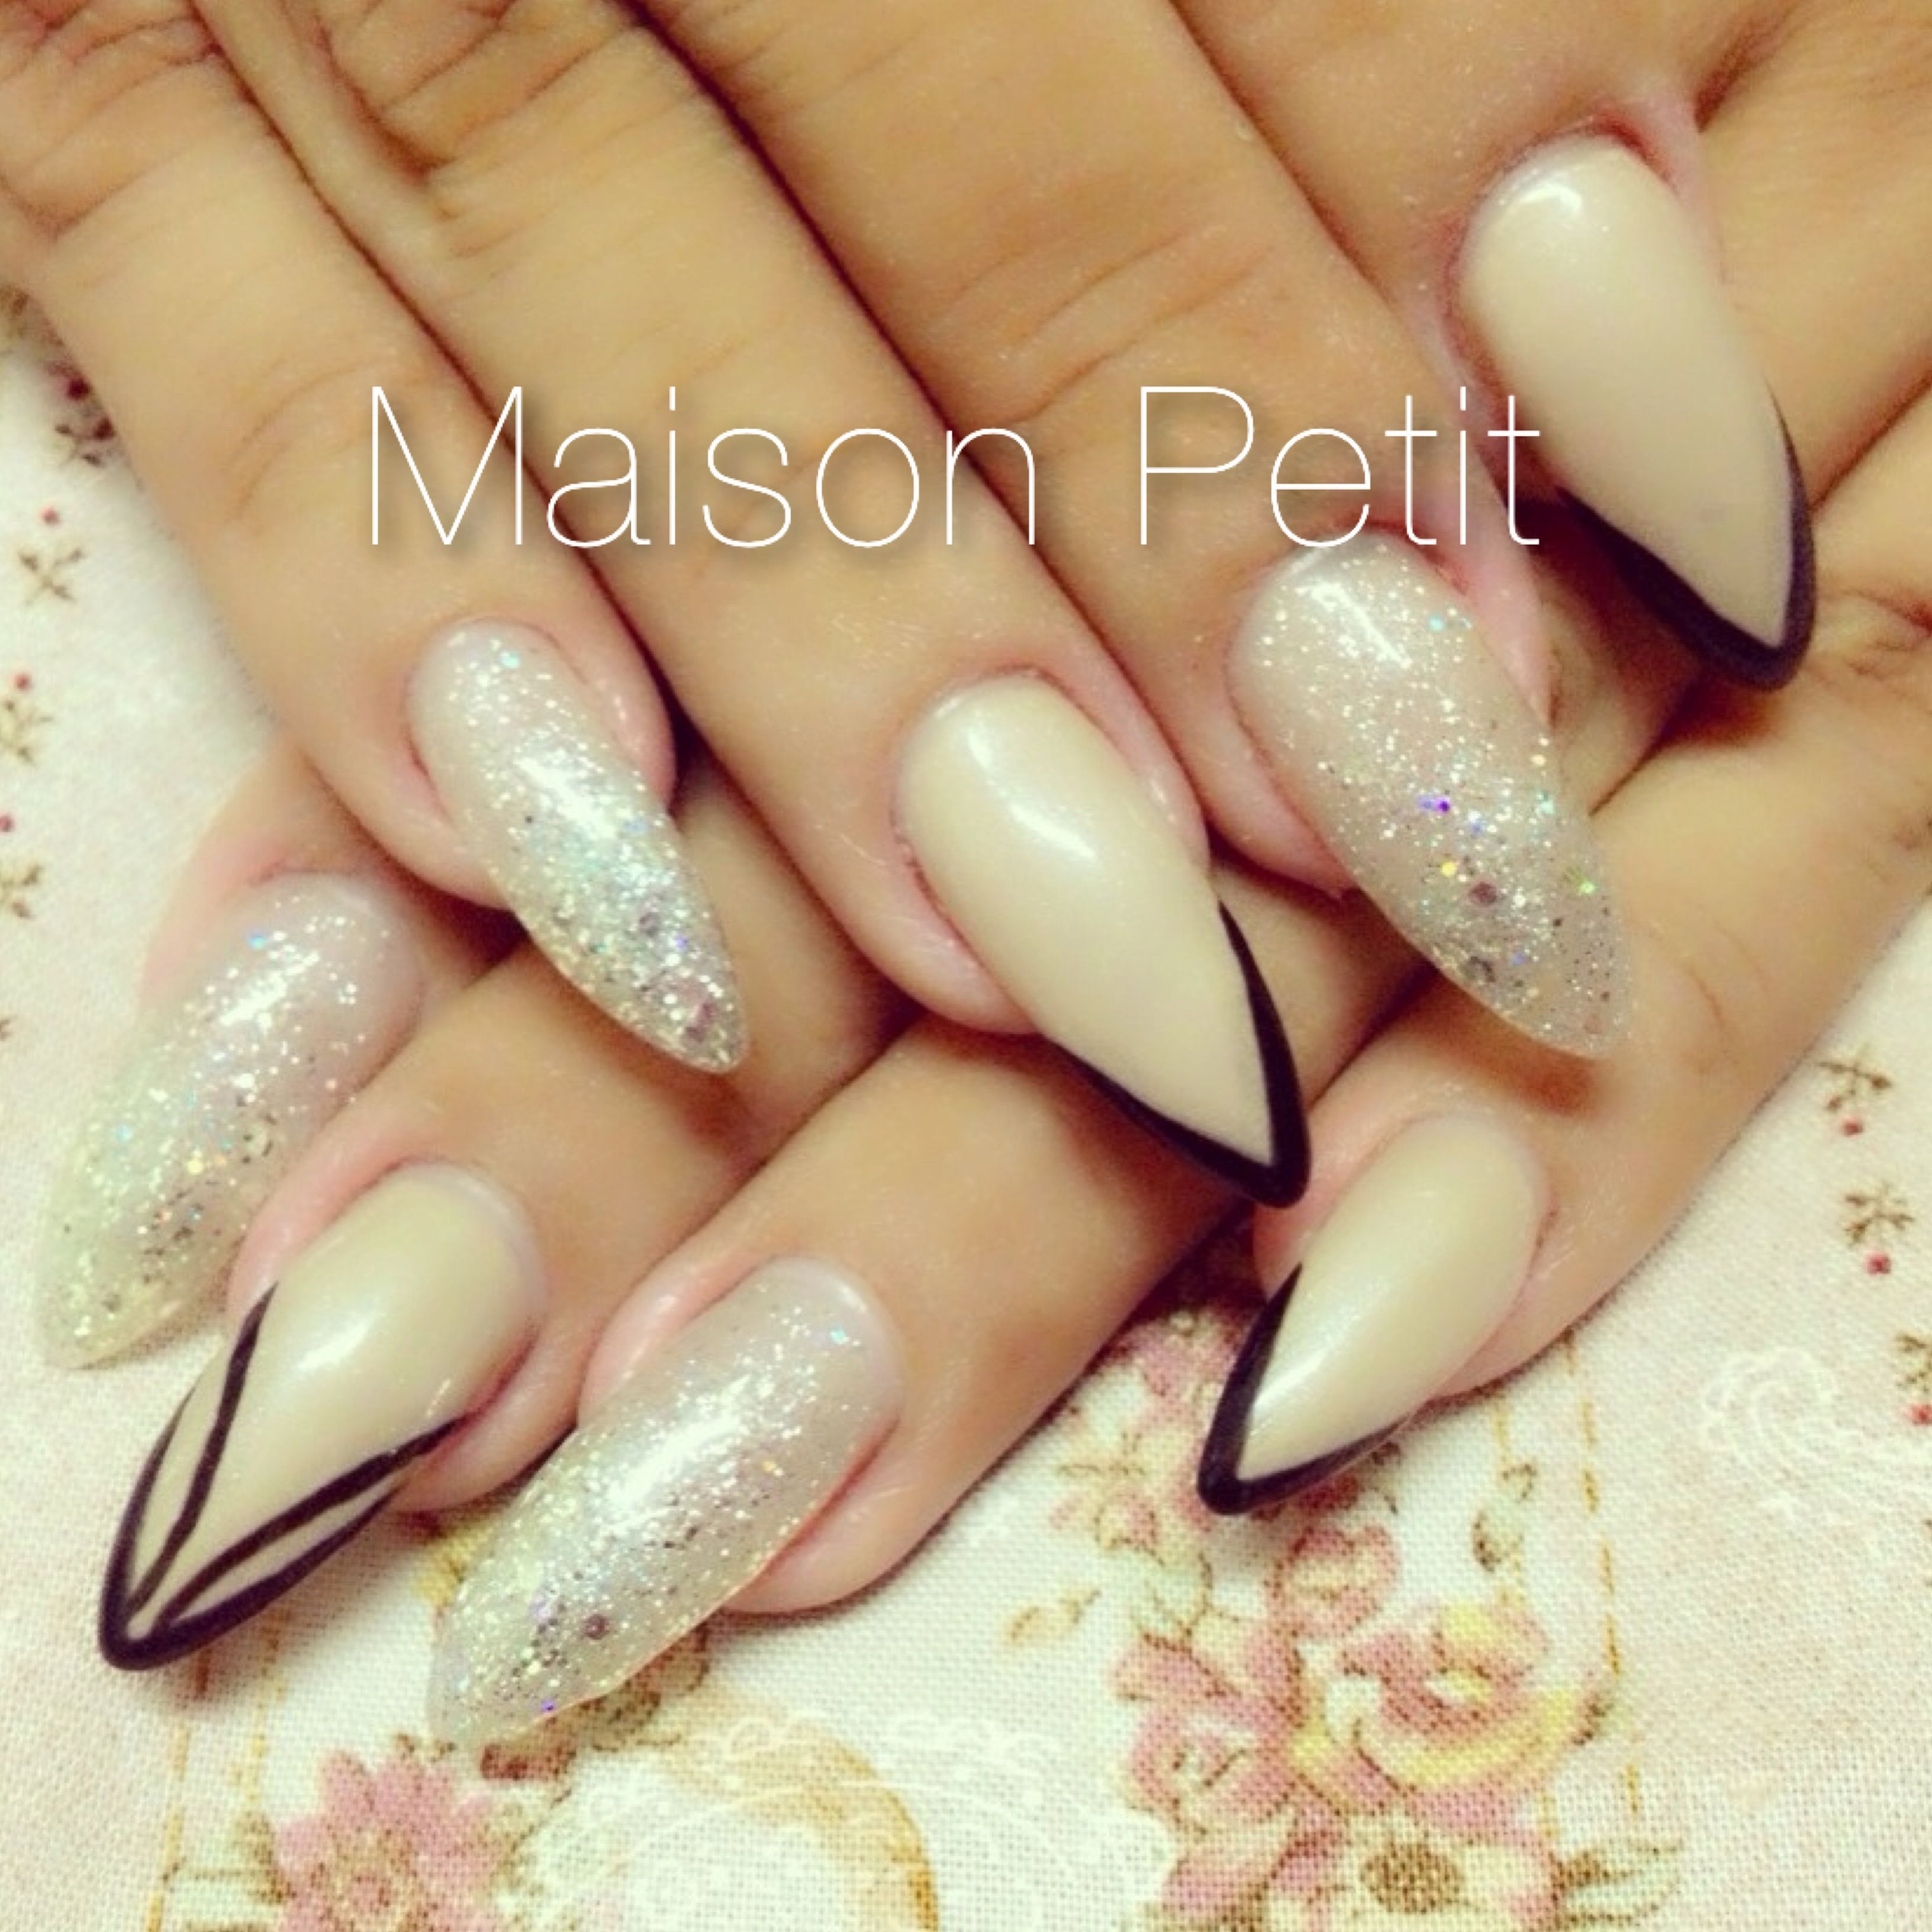 Vintage style stiletto nails! #nails #nailart #3dnailart #3dnails ...